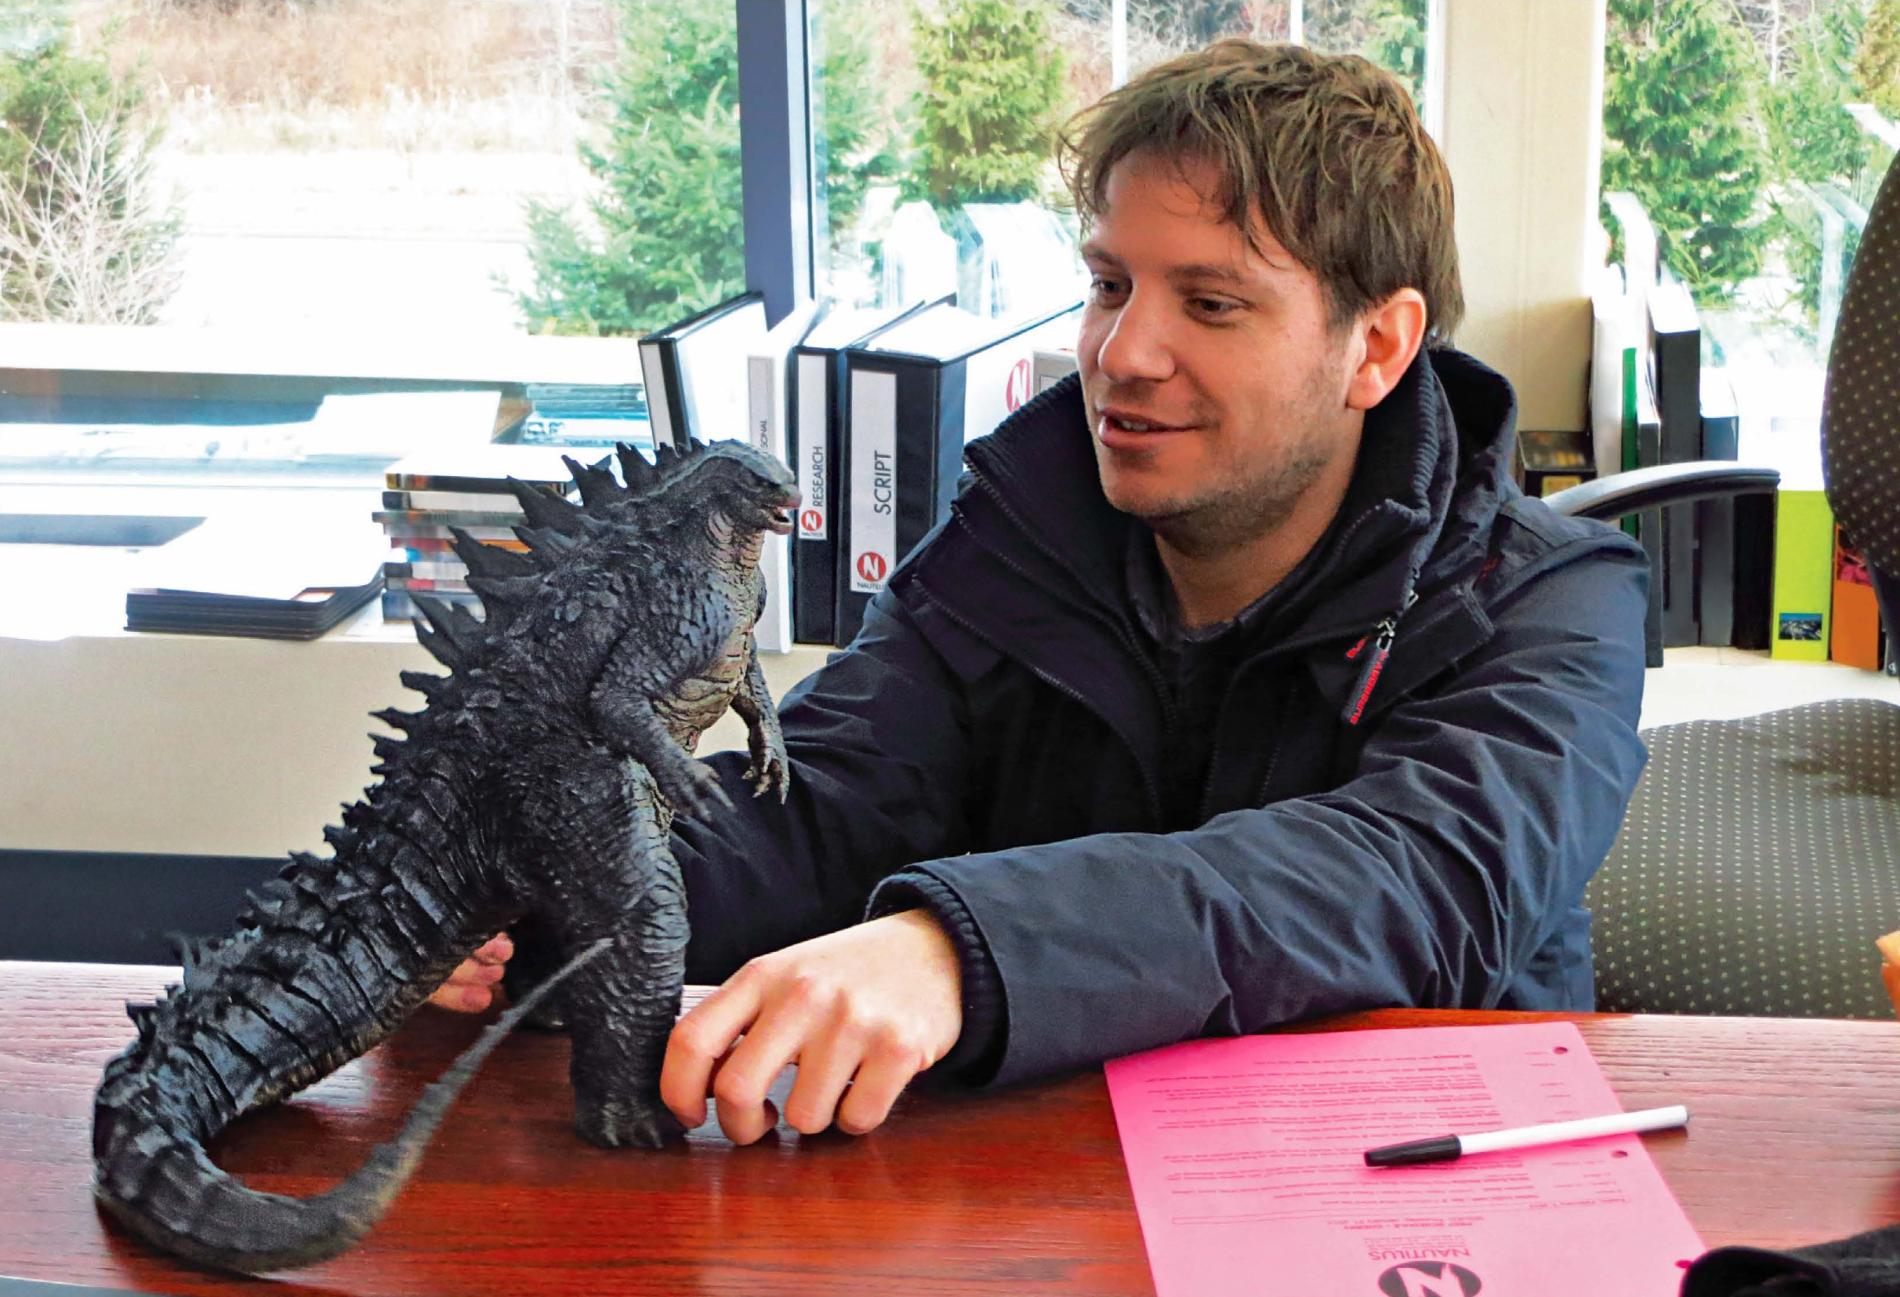 Godzilla_2014_Art_of_Destruction_-_Gareth_Edwards_and_LegendaryGoji_Figure